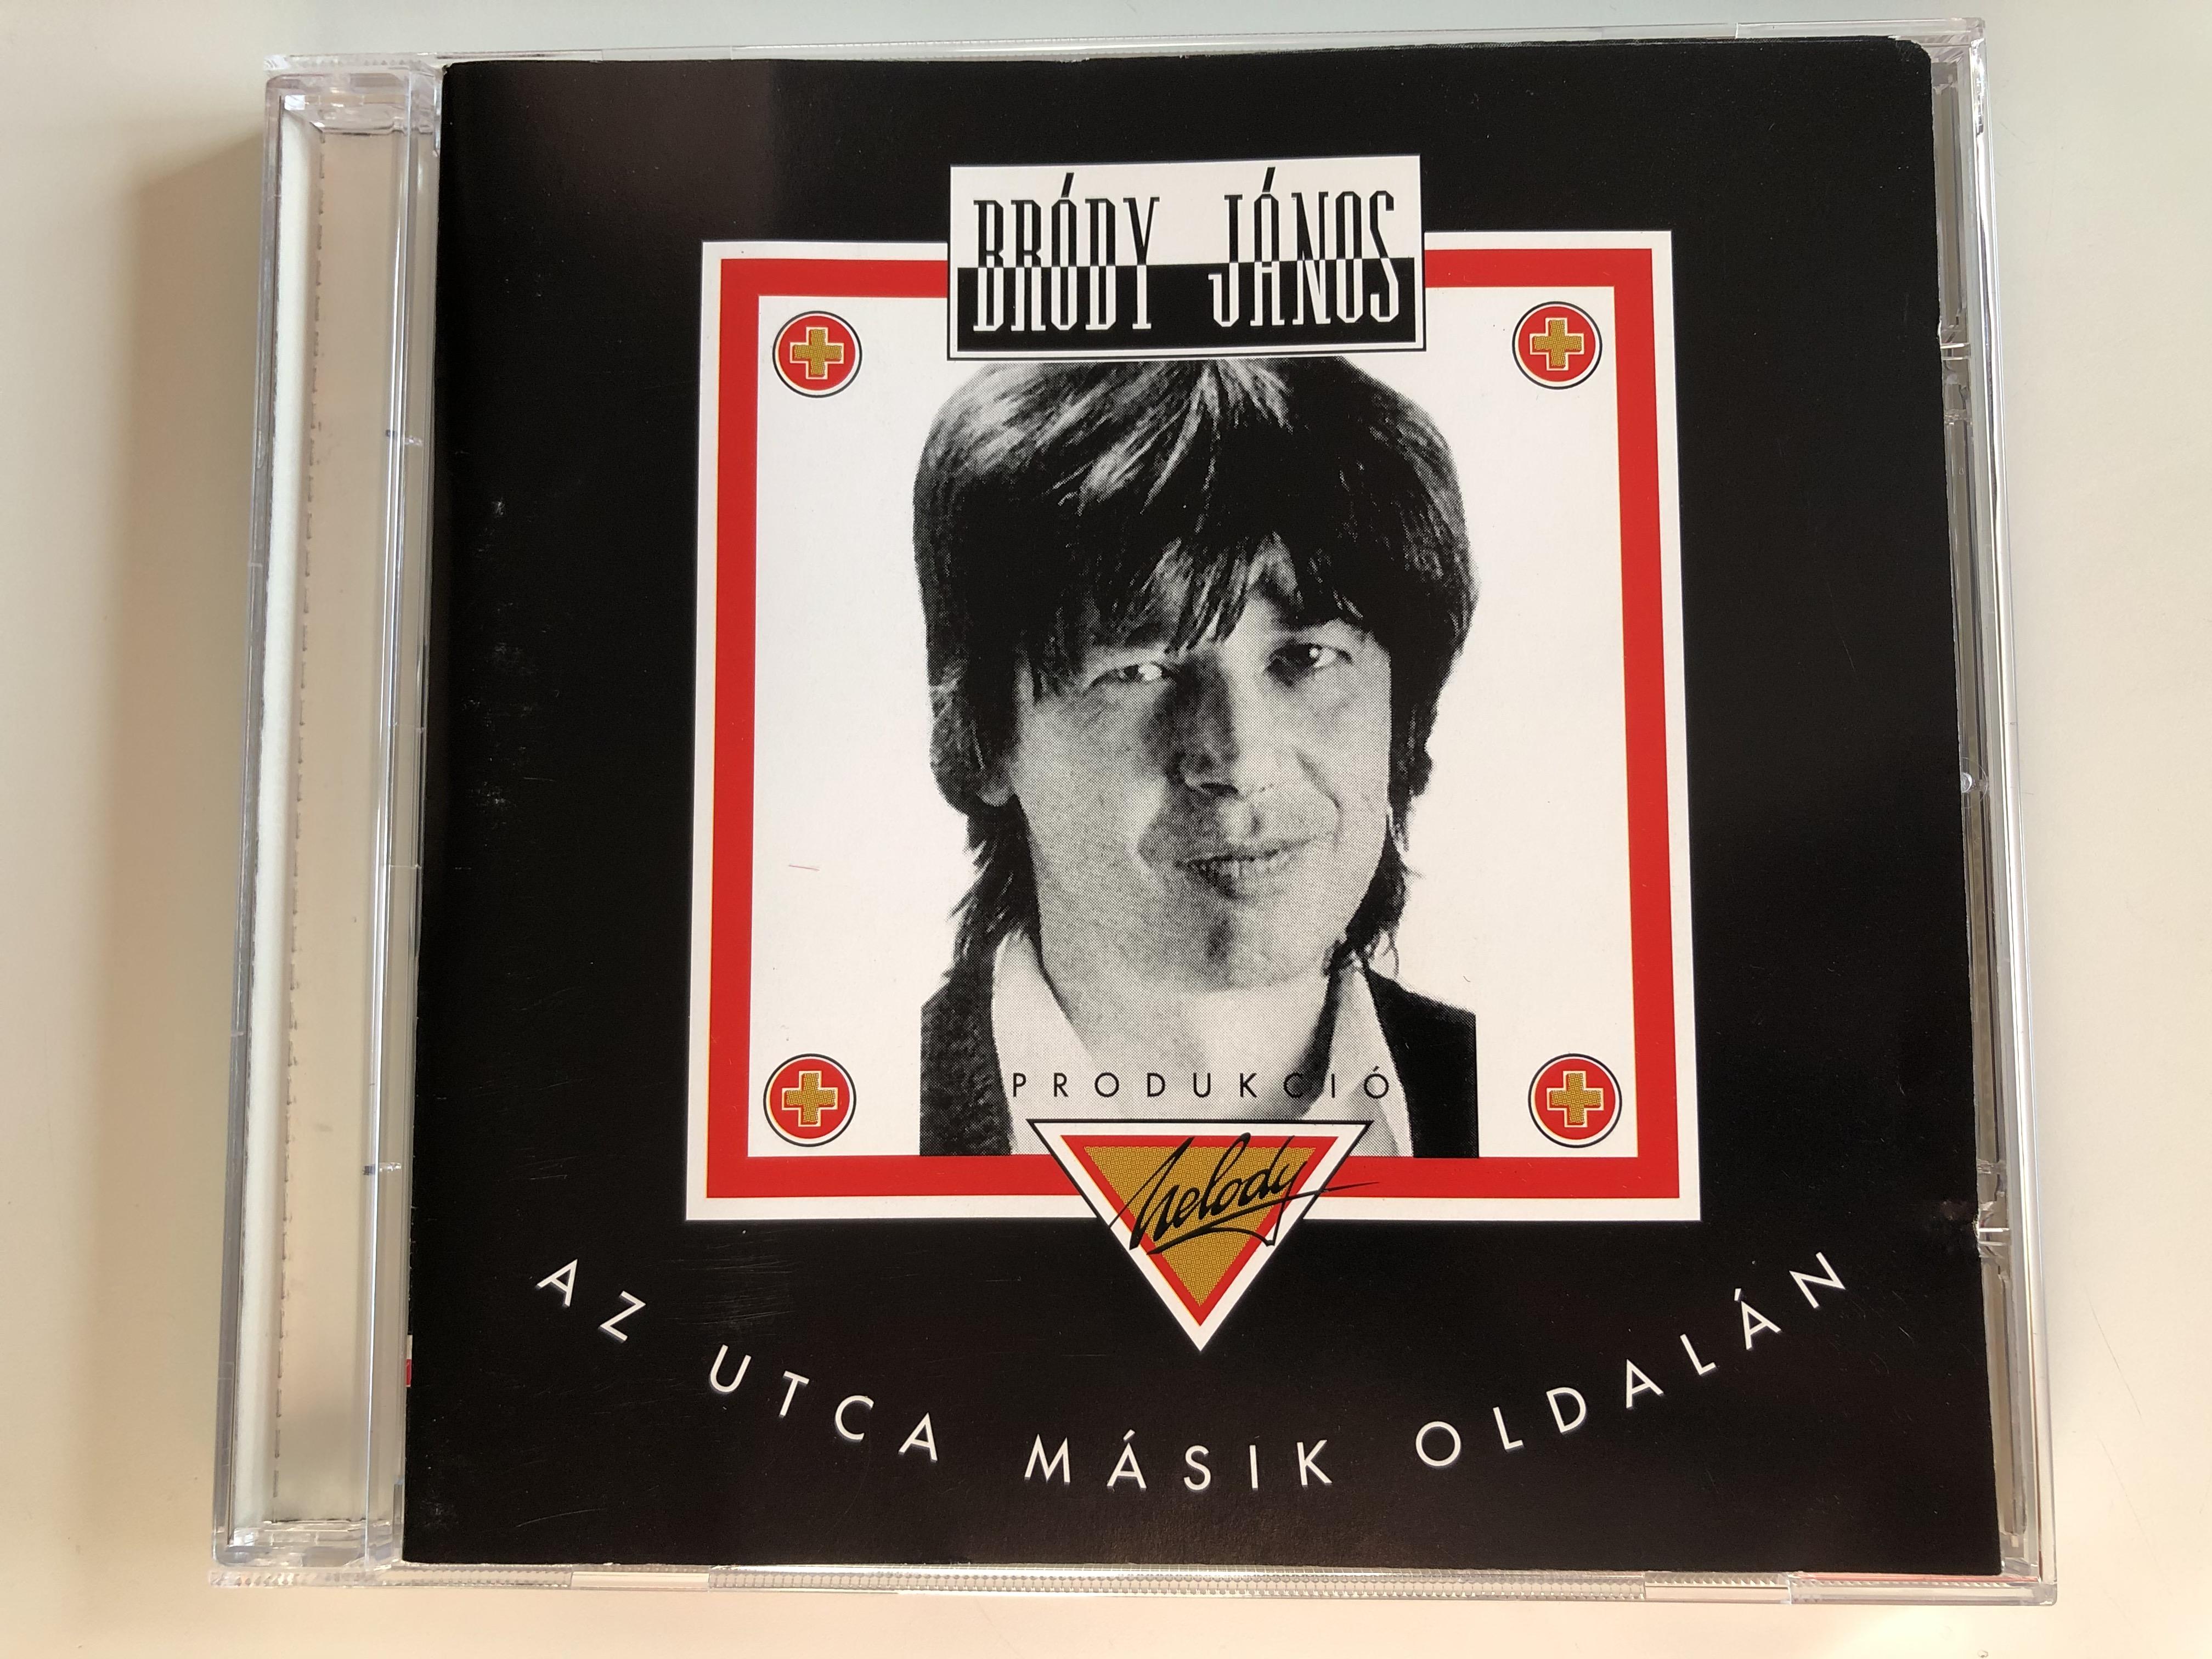 br-dy-j-nos-az-utca-m-sik-oldal-n-private-moon-records-audio-cd-2001-pmr-130102-2-1-.jpg